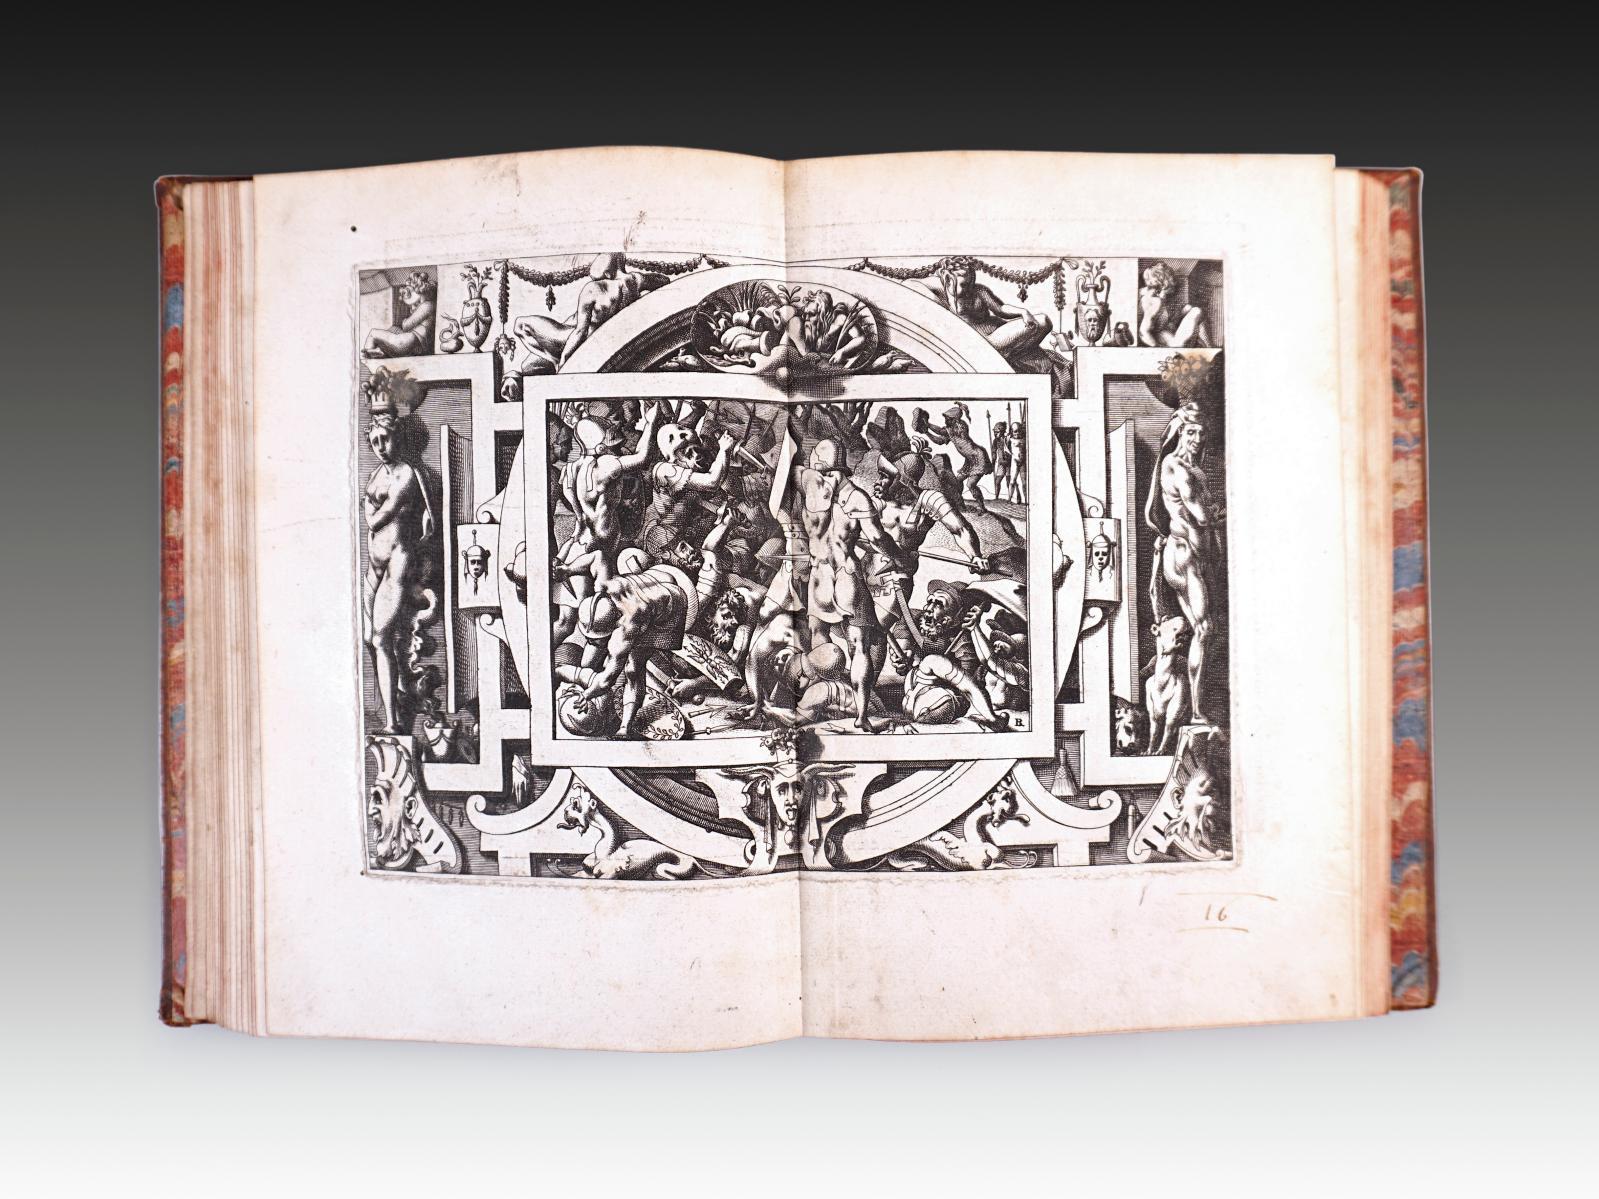 Jacques Gohory, Hystoria Iasonis Thessaliae Principis de Colchica velleris aurei expeditione, un volume in-4°, Paris, 1563, Jean de Maureg